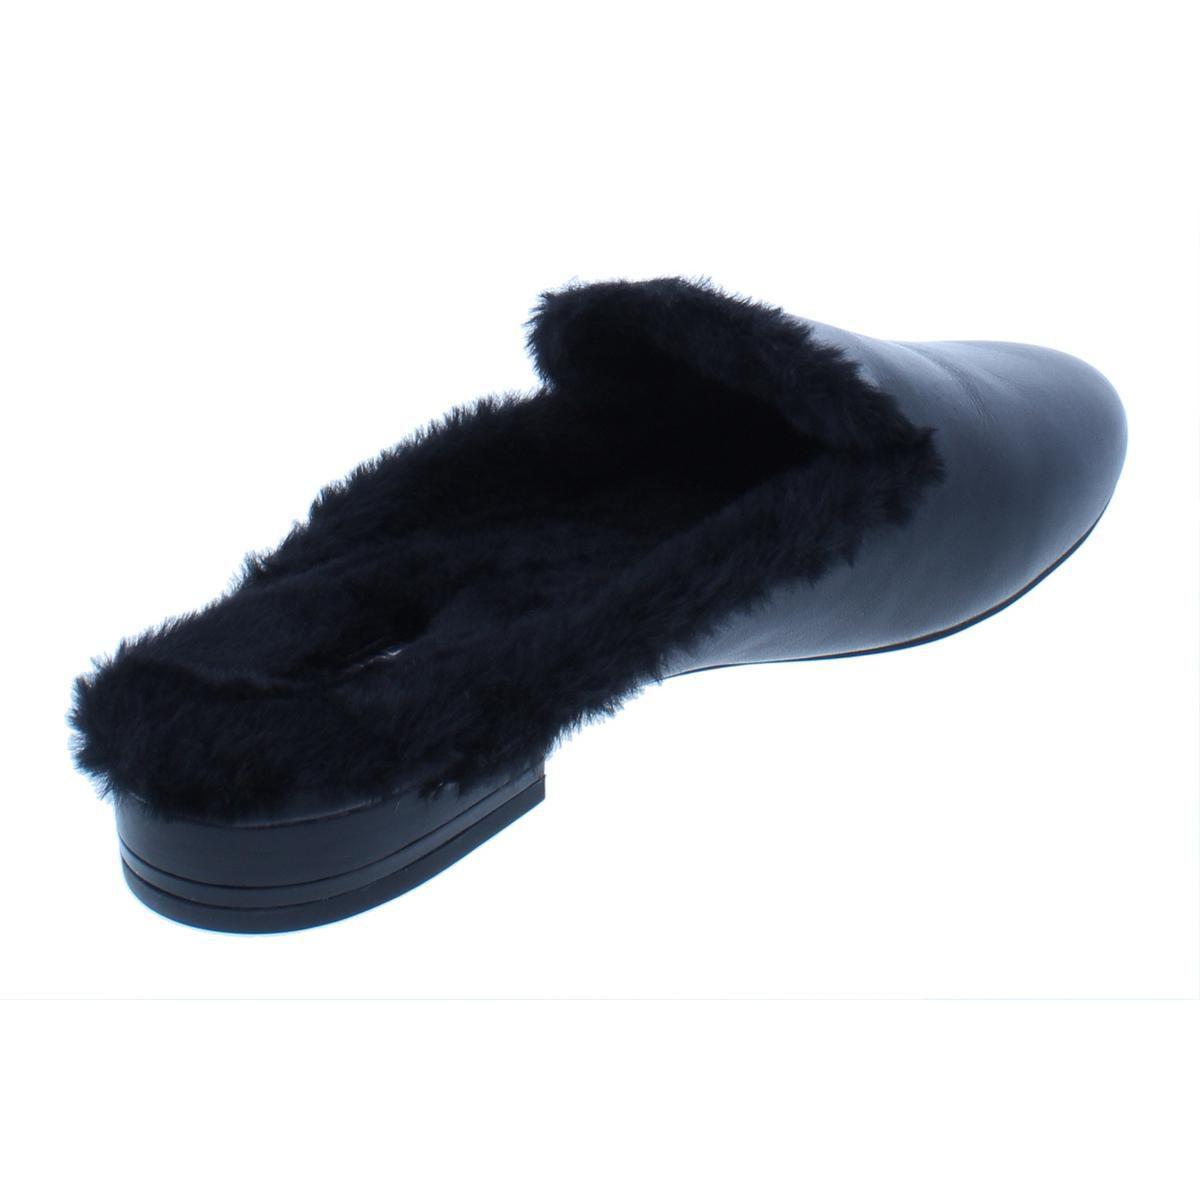 449db58b703 Lyst - Michael Michael Kors Womens Natasha Leather Casual Mules in Black